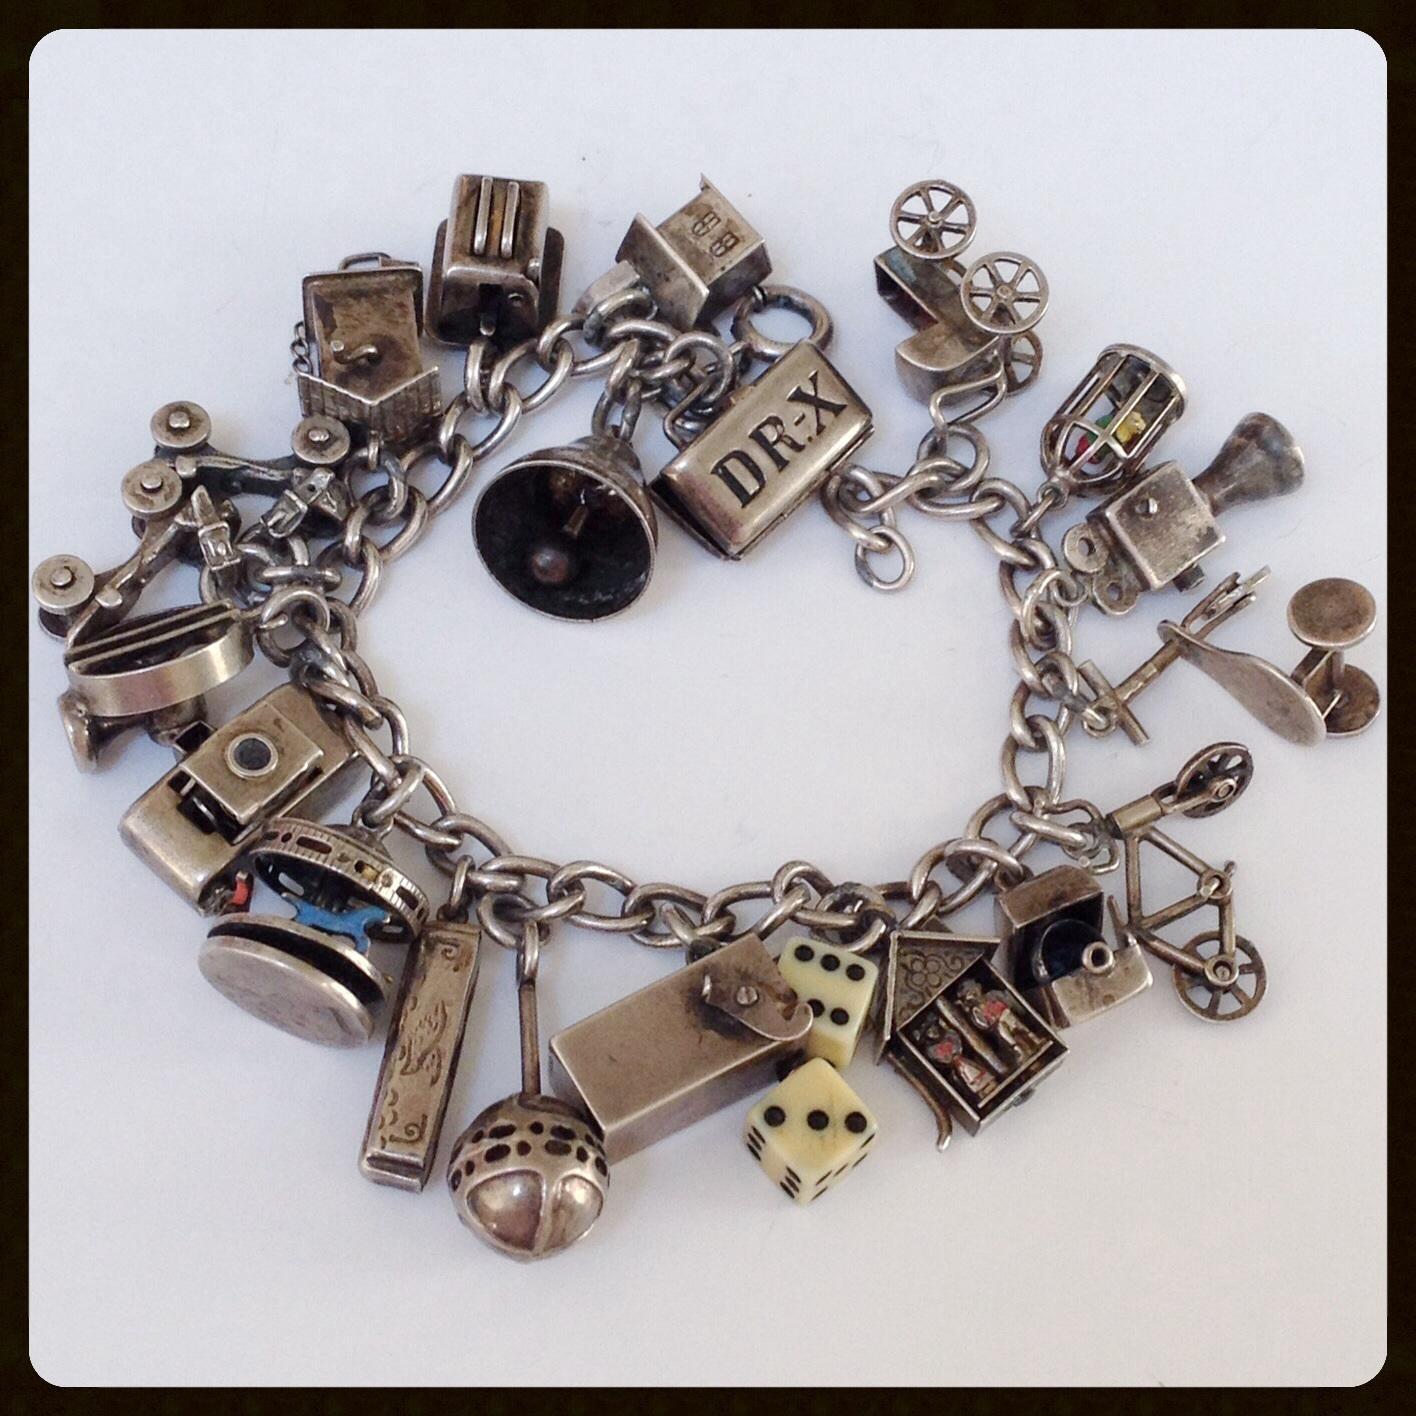 Rare Articulated Mechanical Vintage Art Deco Charm Bracelet